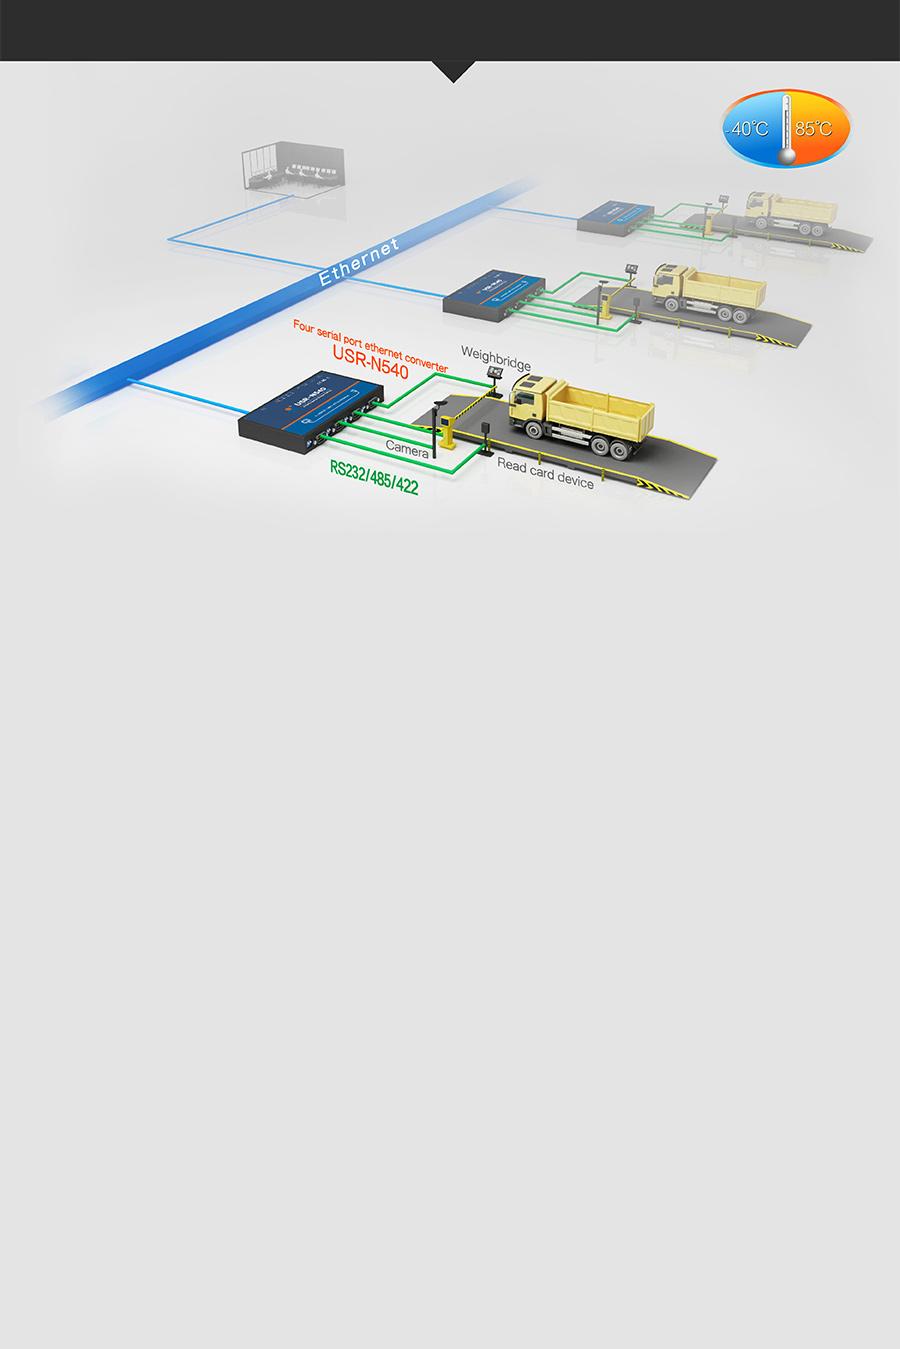 Application of USR-N540 Serial to IP Converters: Unattended Weighing